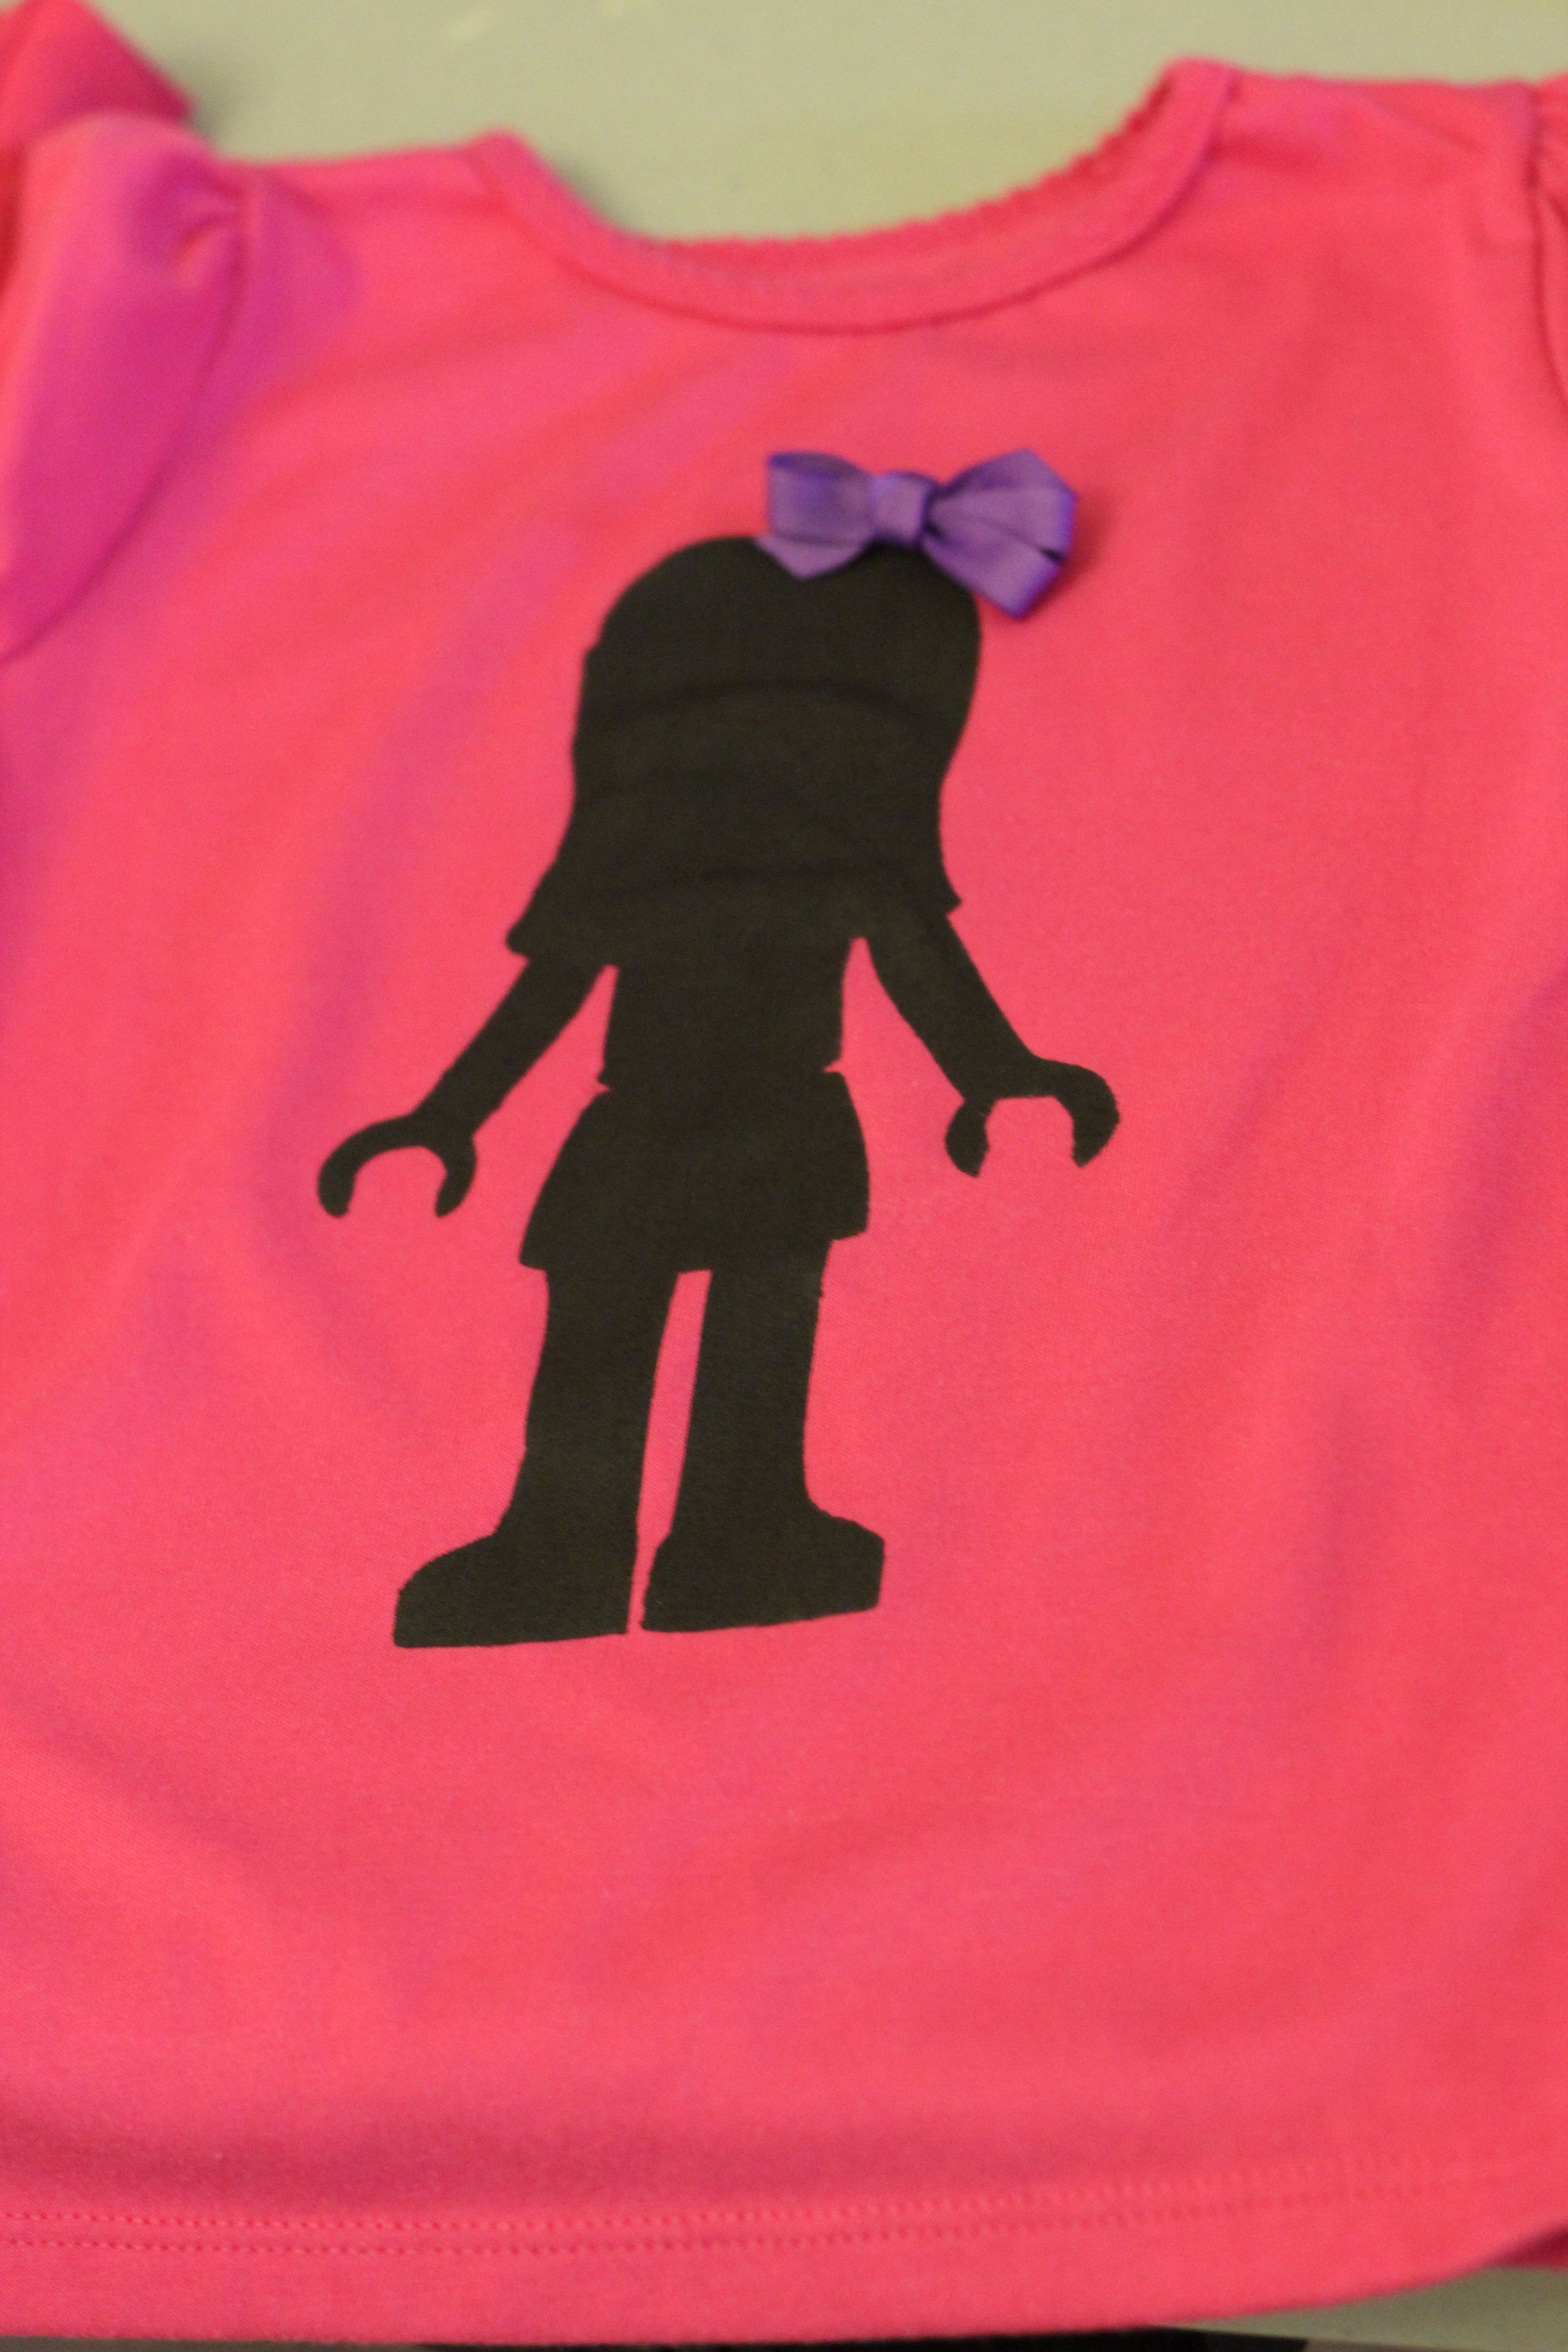 Lego friends shirt. So cute! @Katie Hrubec Hrubec Schmeltzer Schmeltzer Moravec Libby should get this!